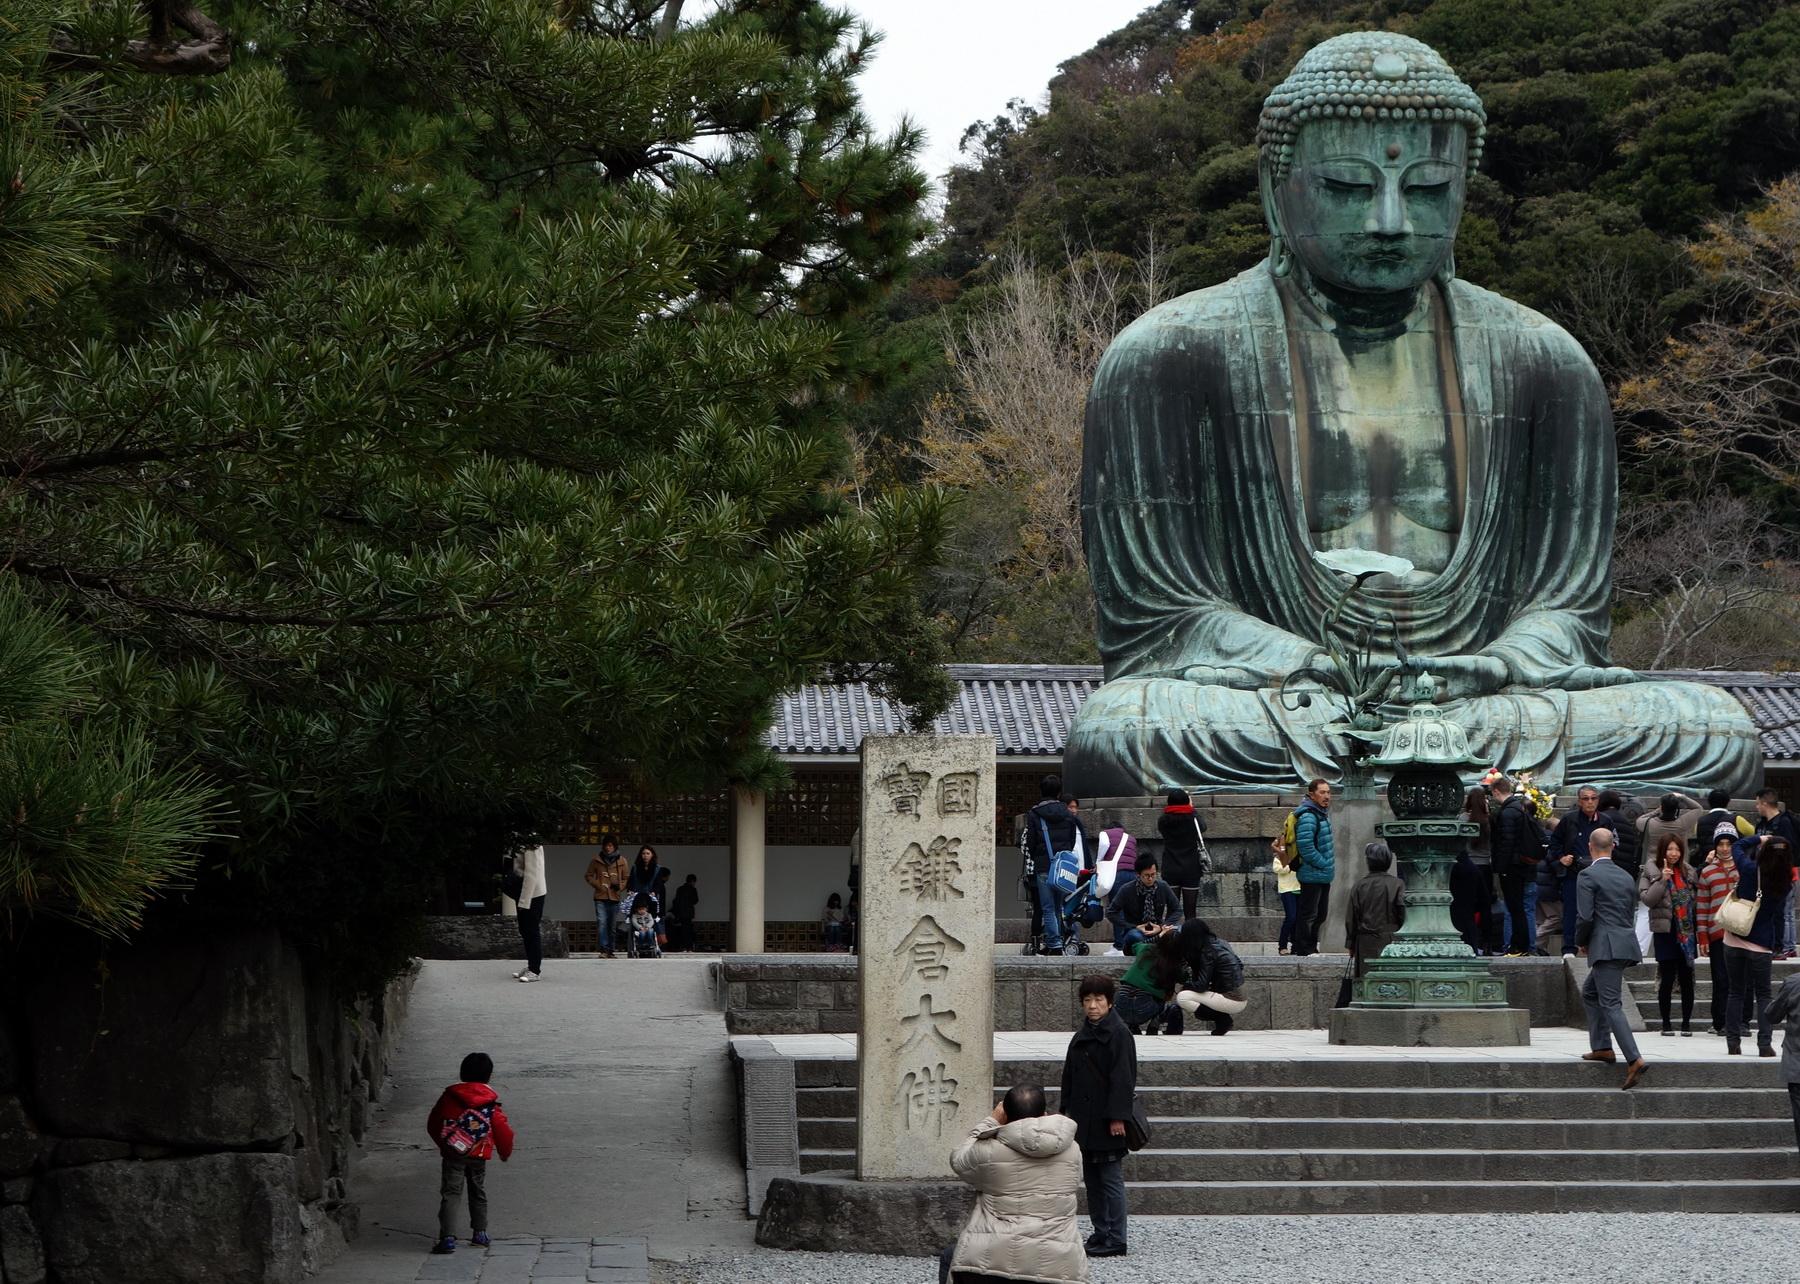 Grat Buddha statue in Kotoku-in